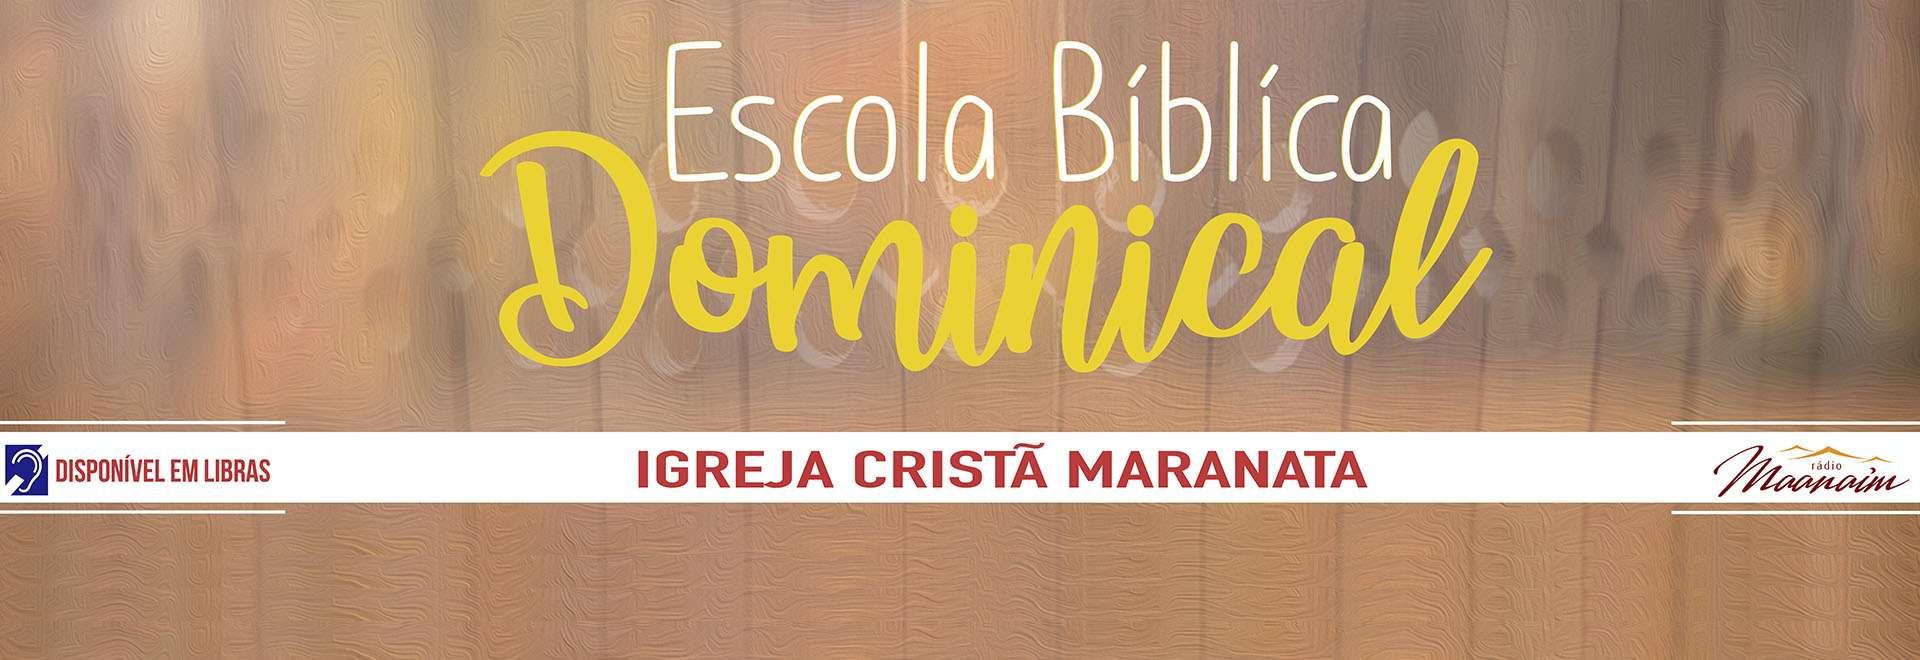 Participações da EBD da Igreja Cristã Maranata - 28/02/2021